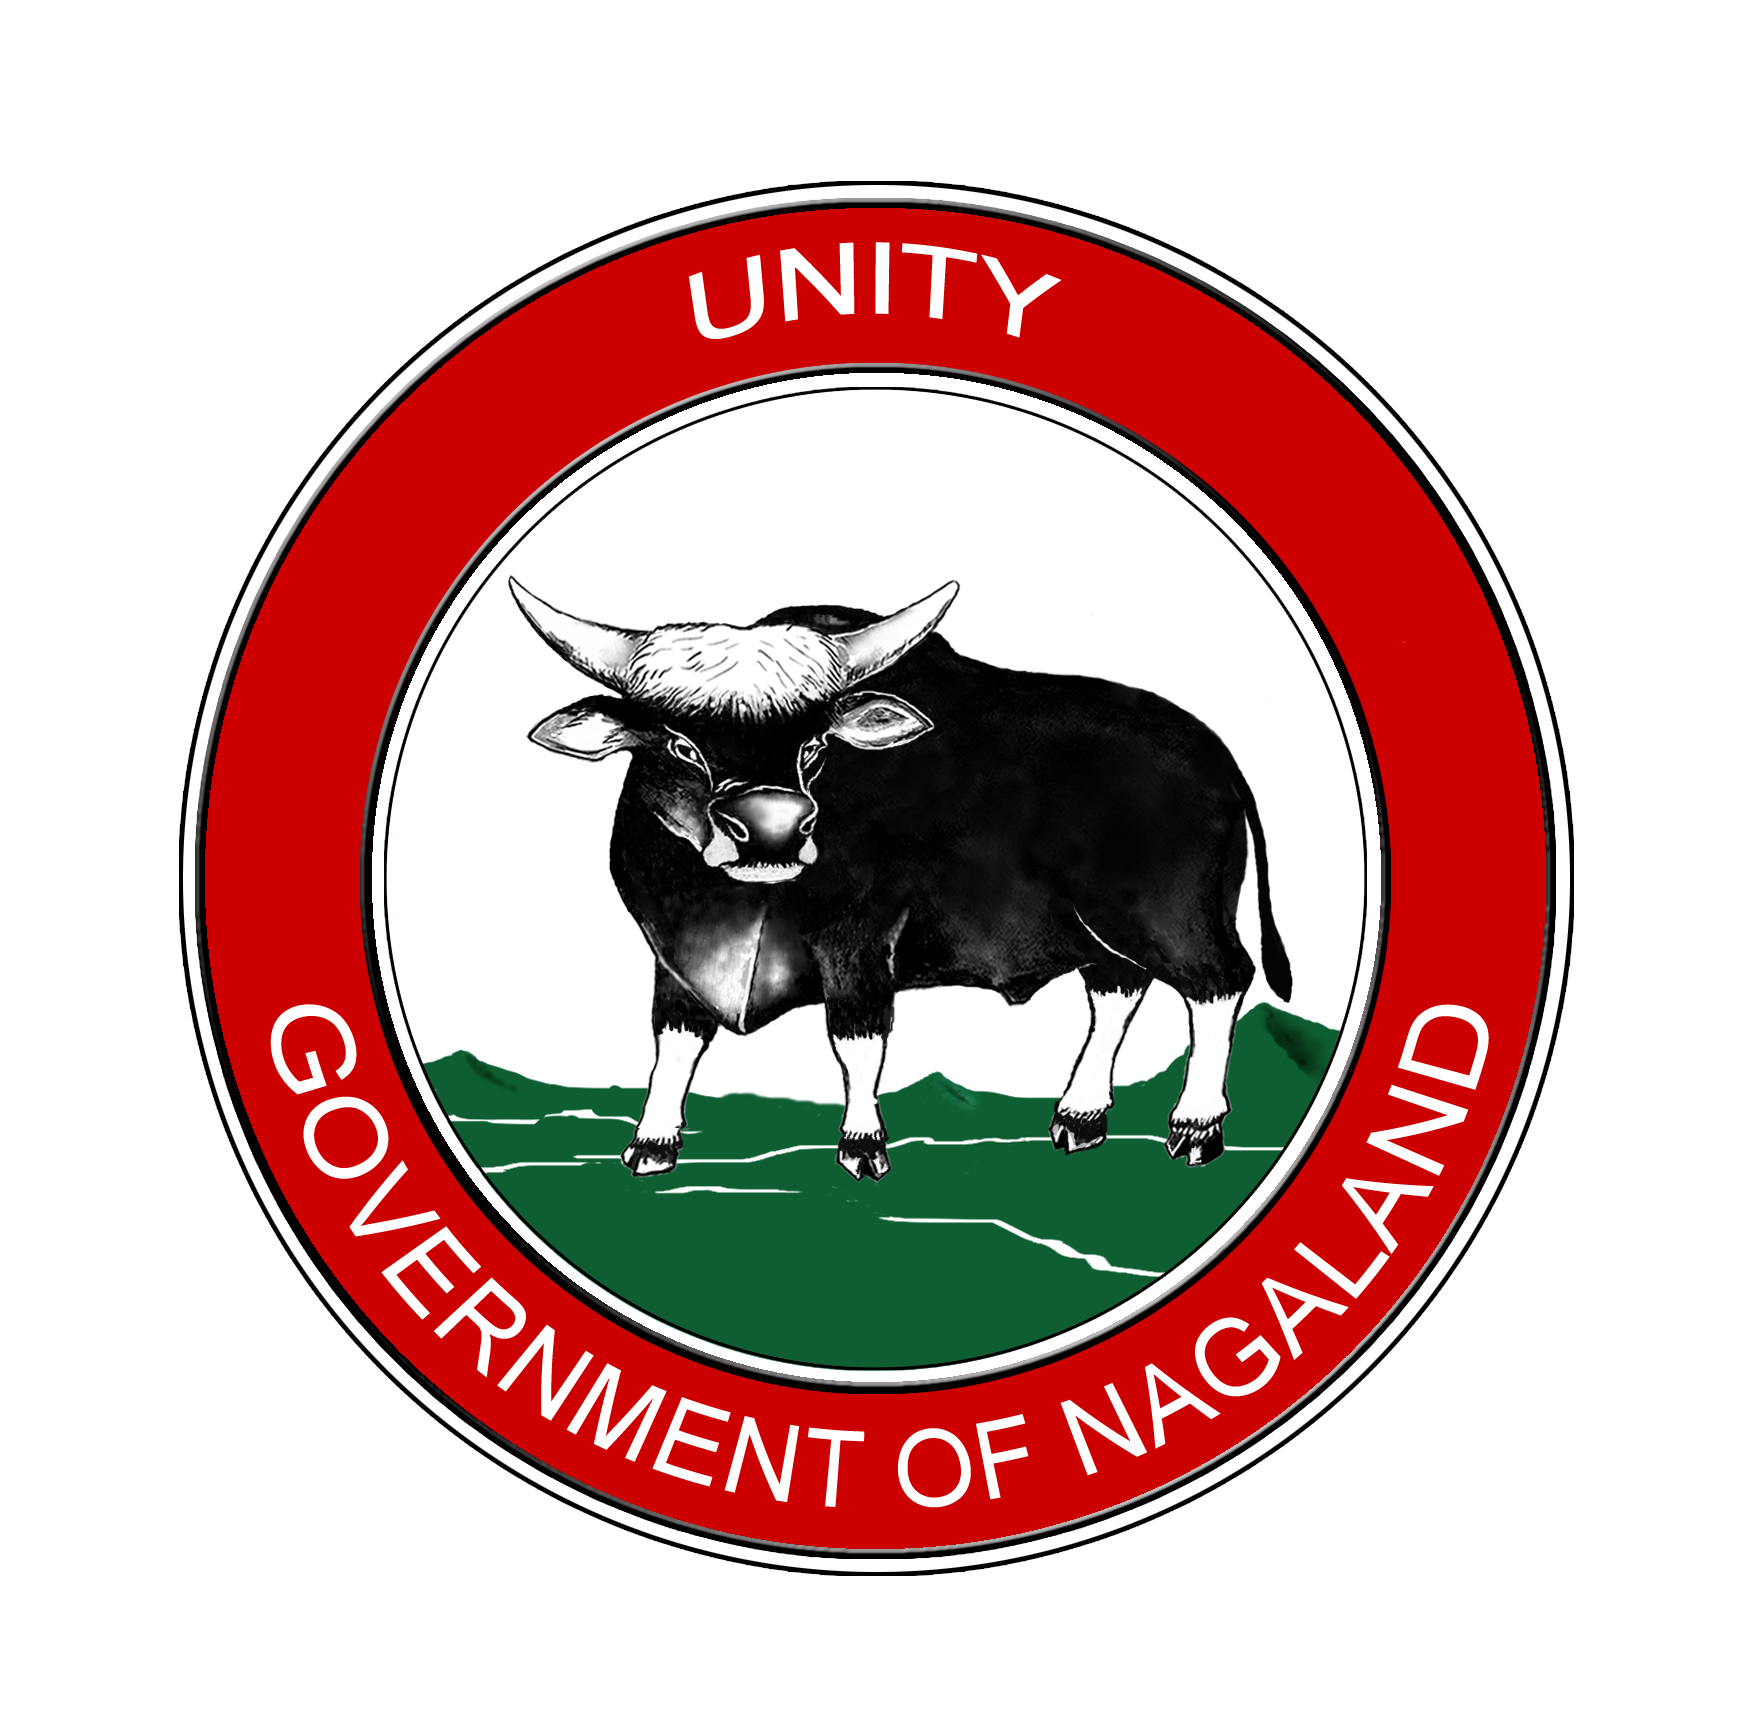 Forest Department Nagaland